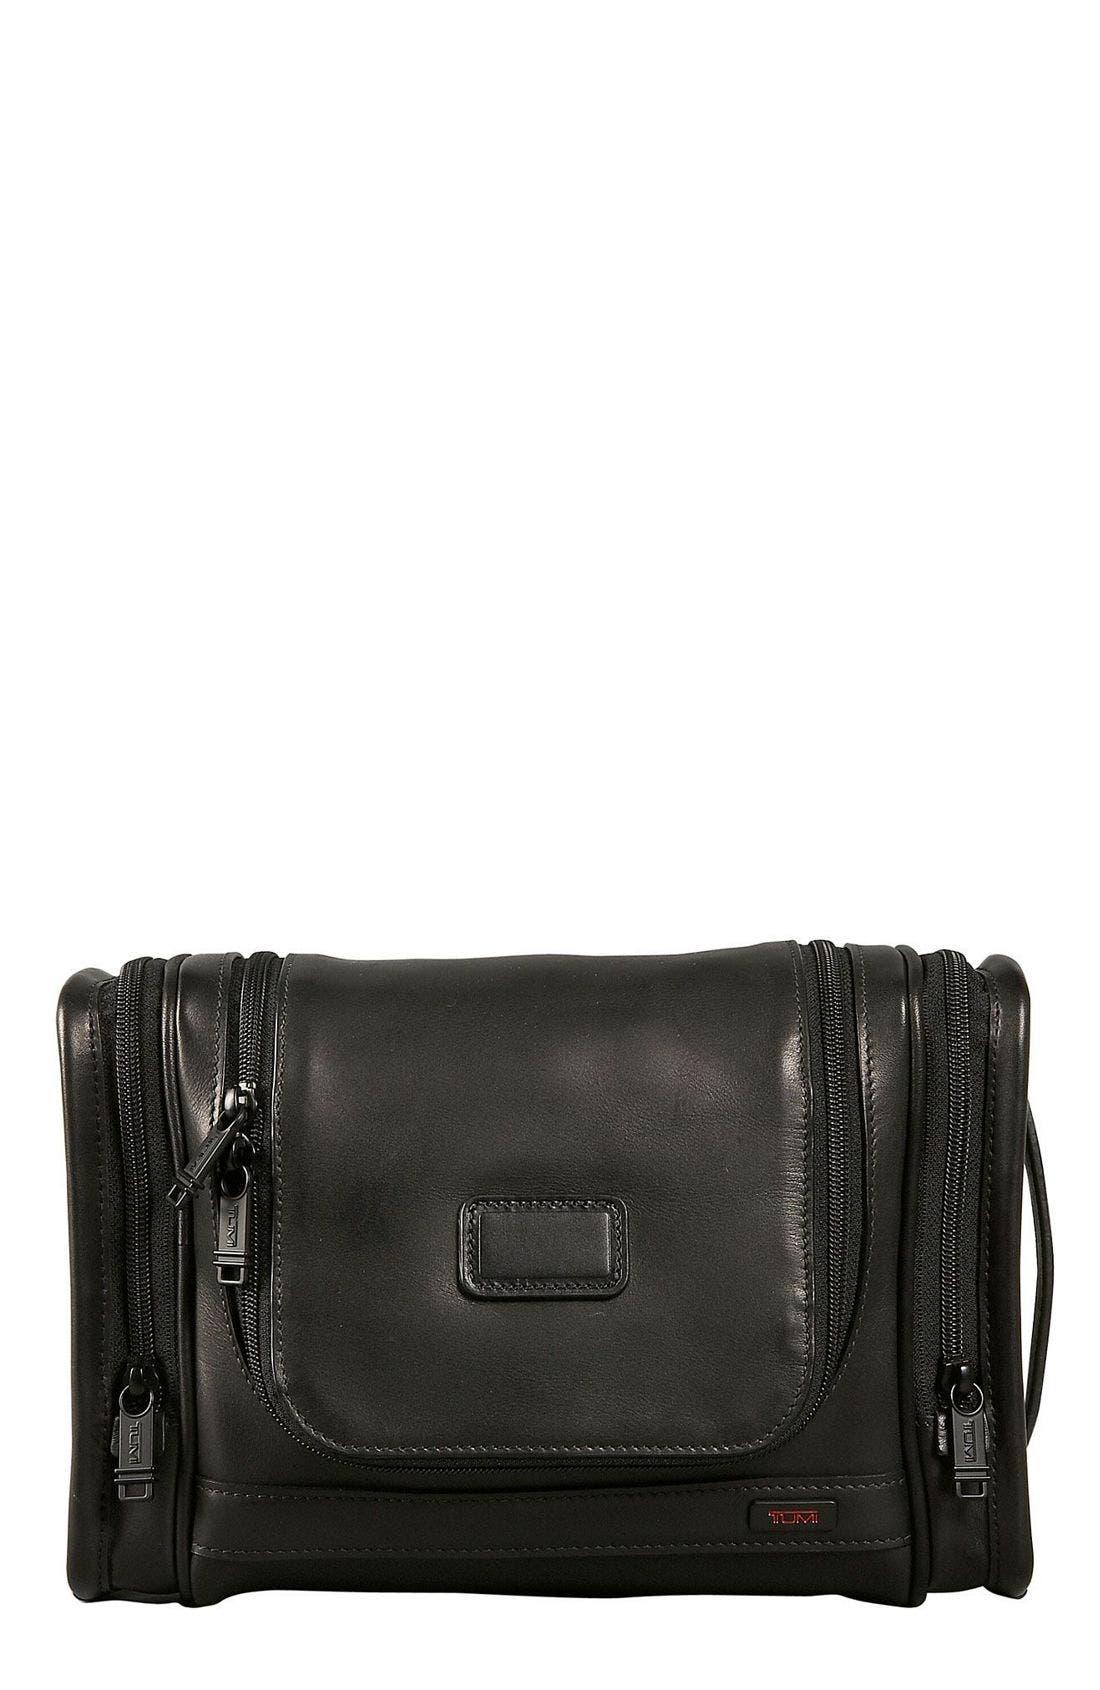 Alternate Image 1 Selected - Tumi 'Alpha' Hanging Leather Travel Kit